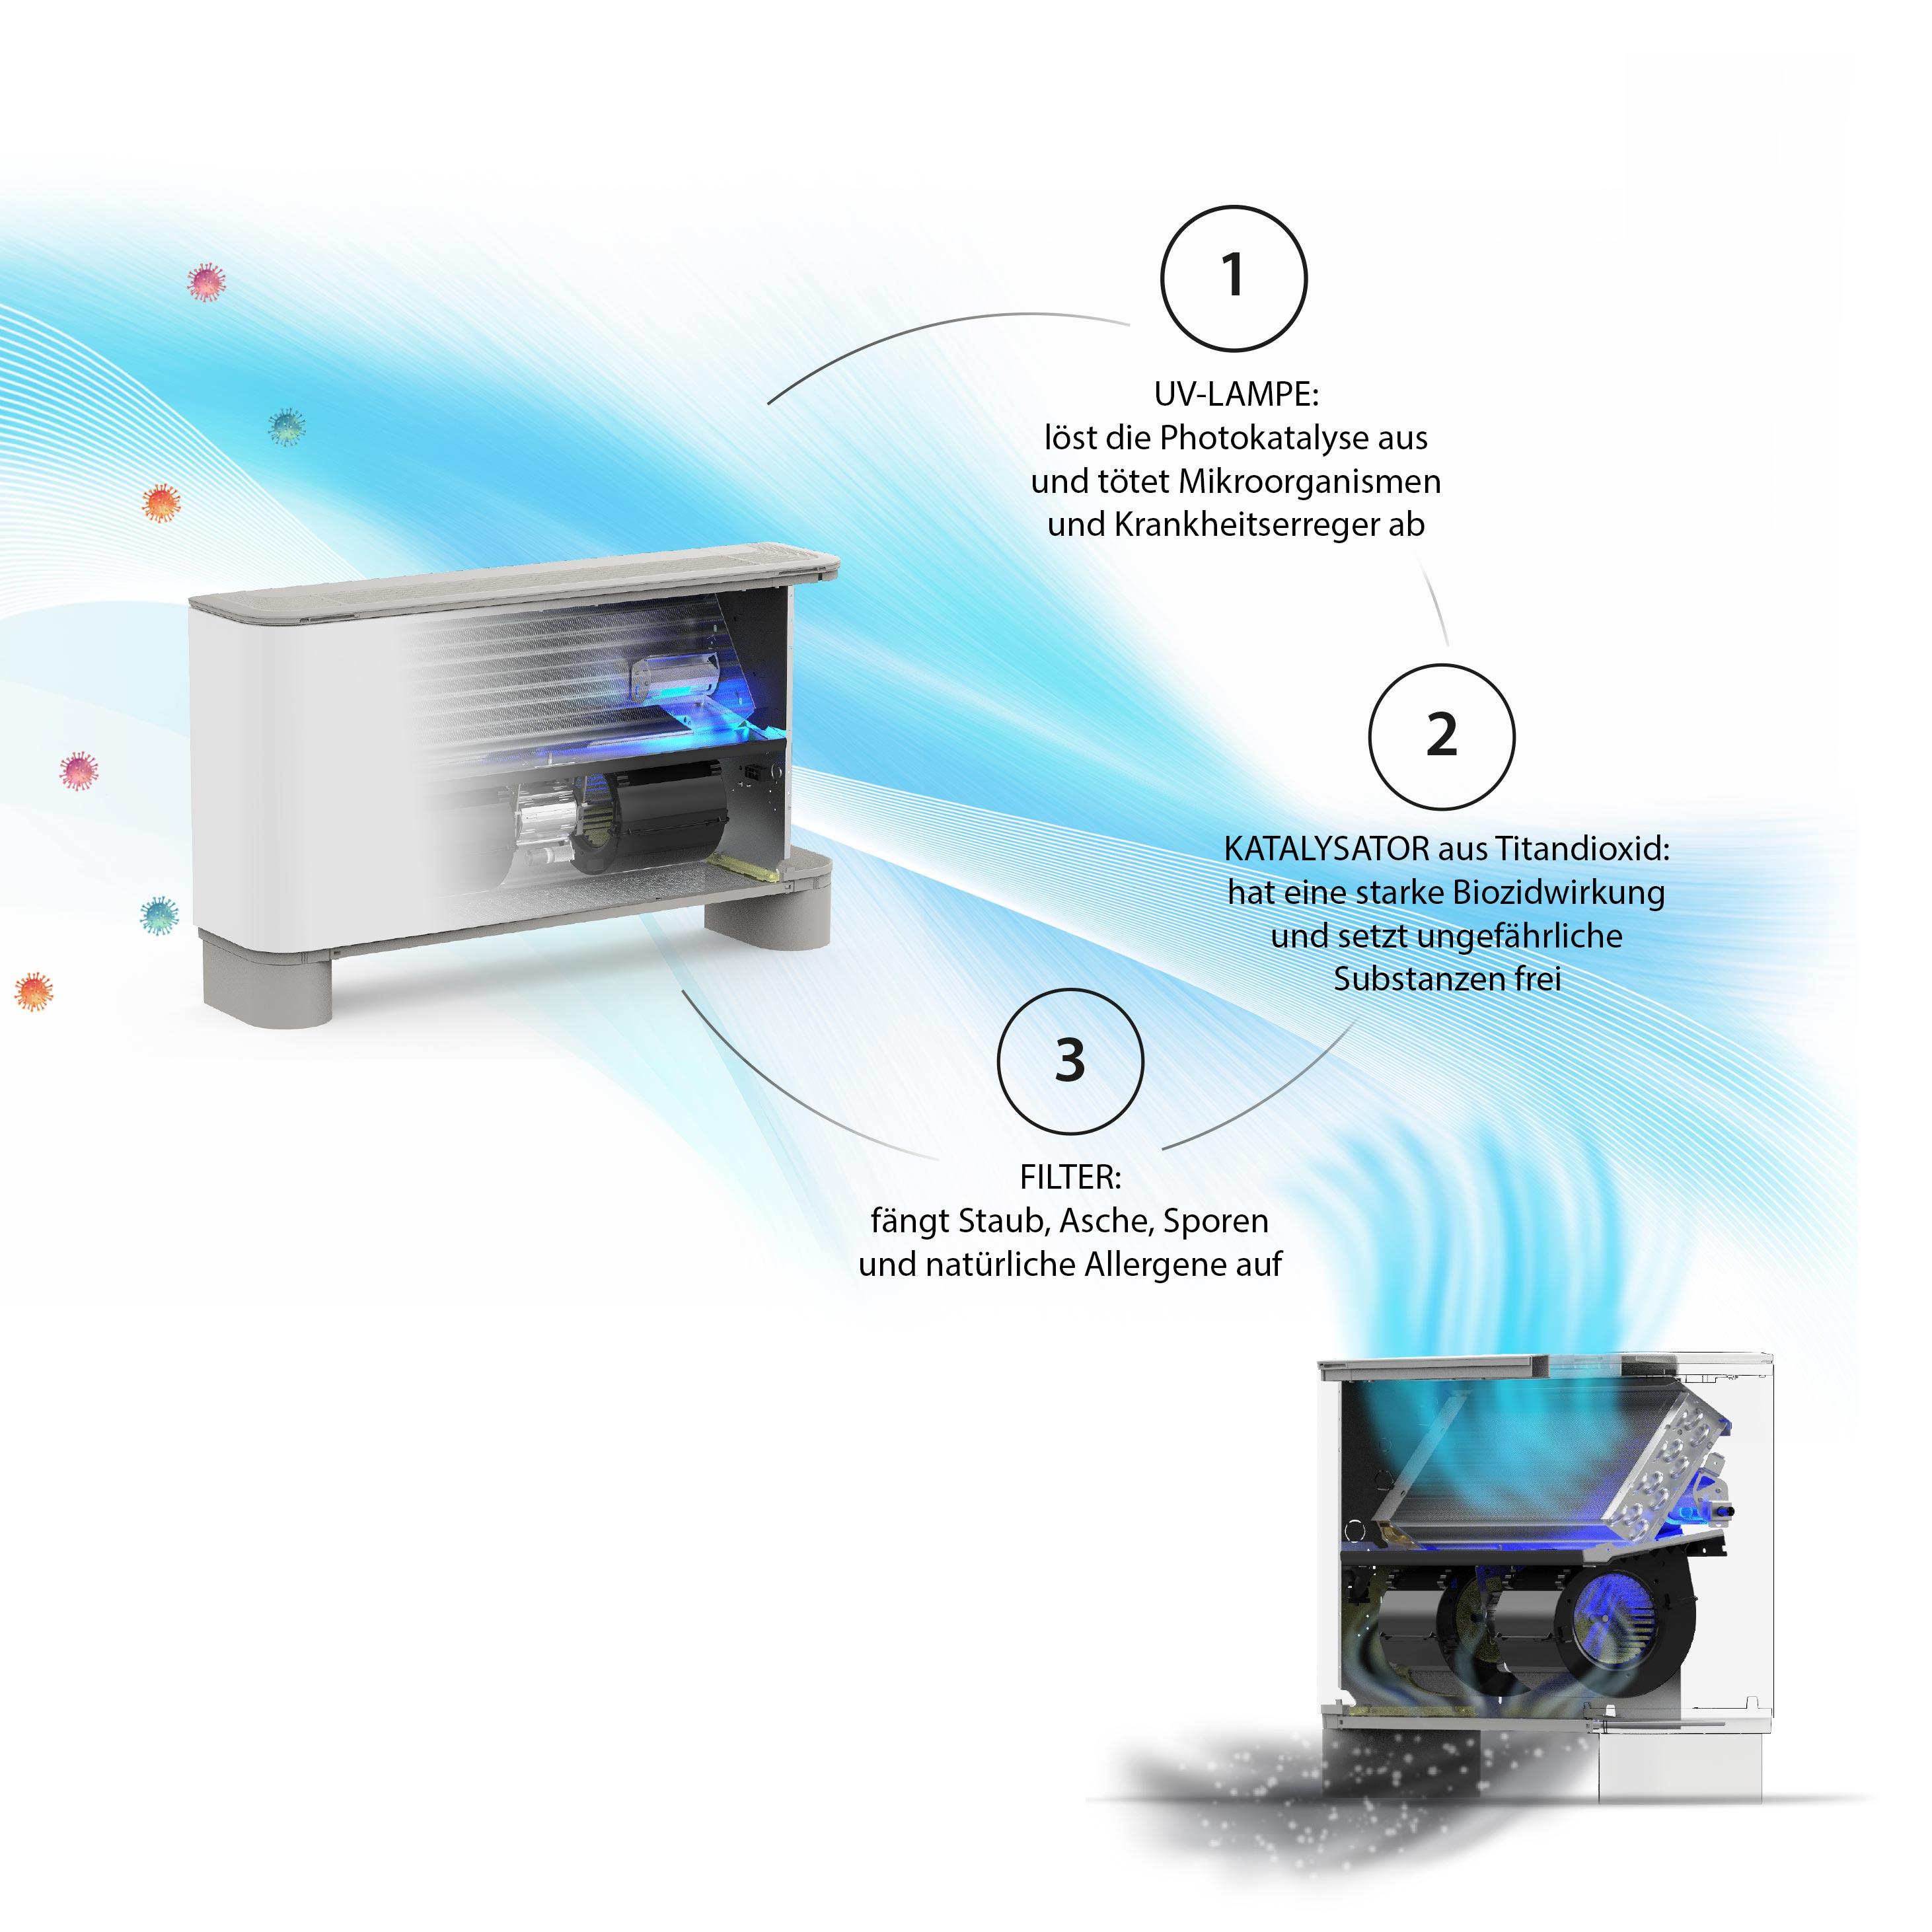 Aermec - Photokatalytischer Technologie